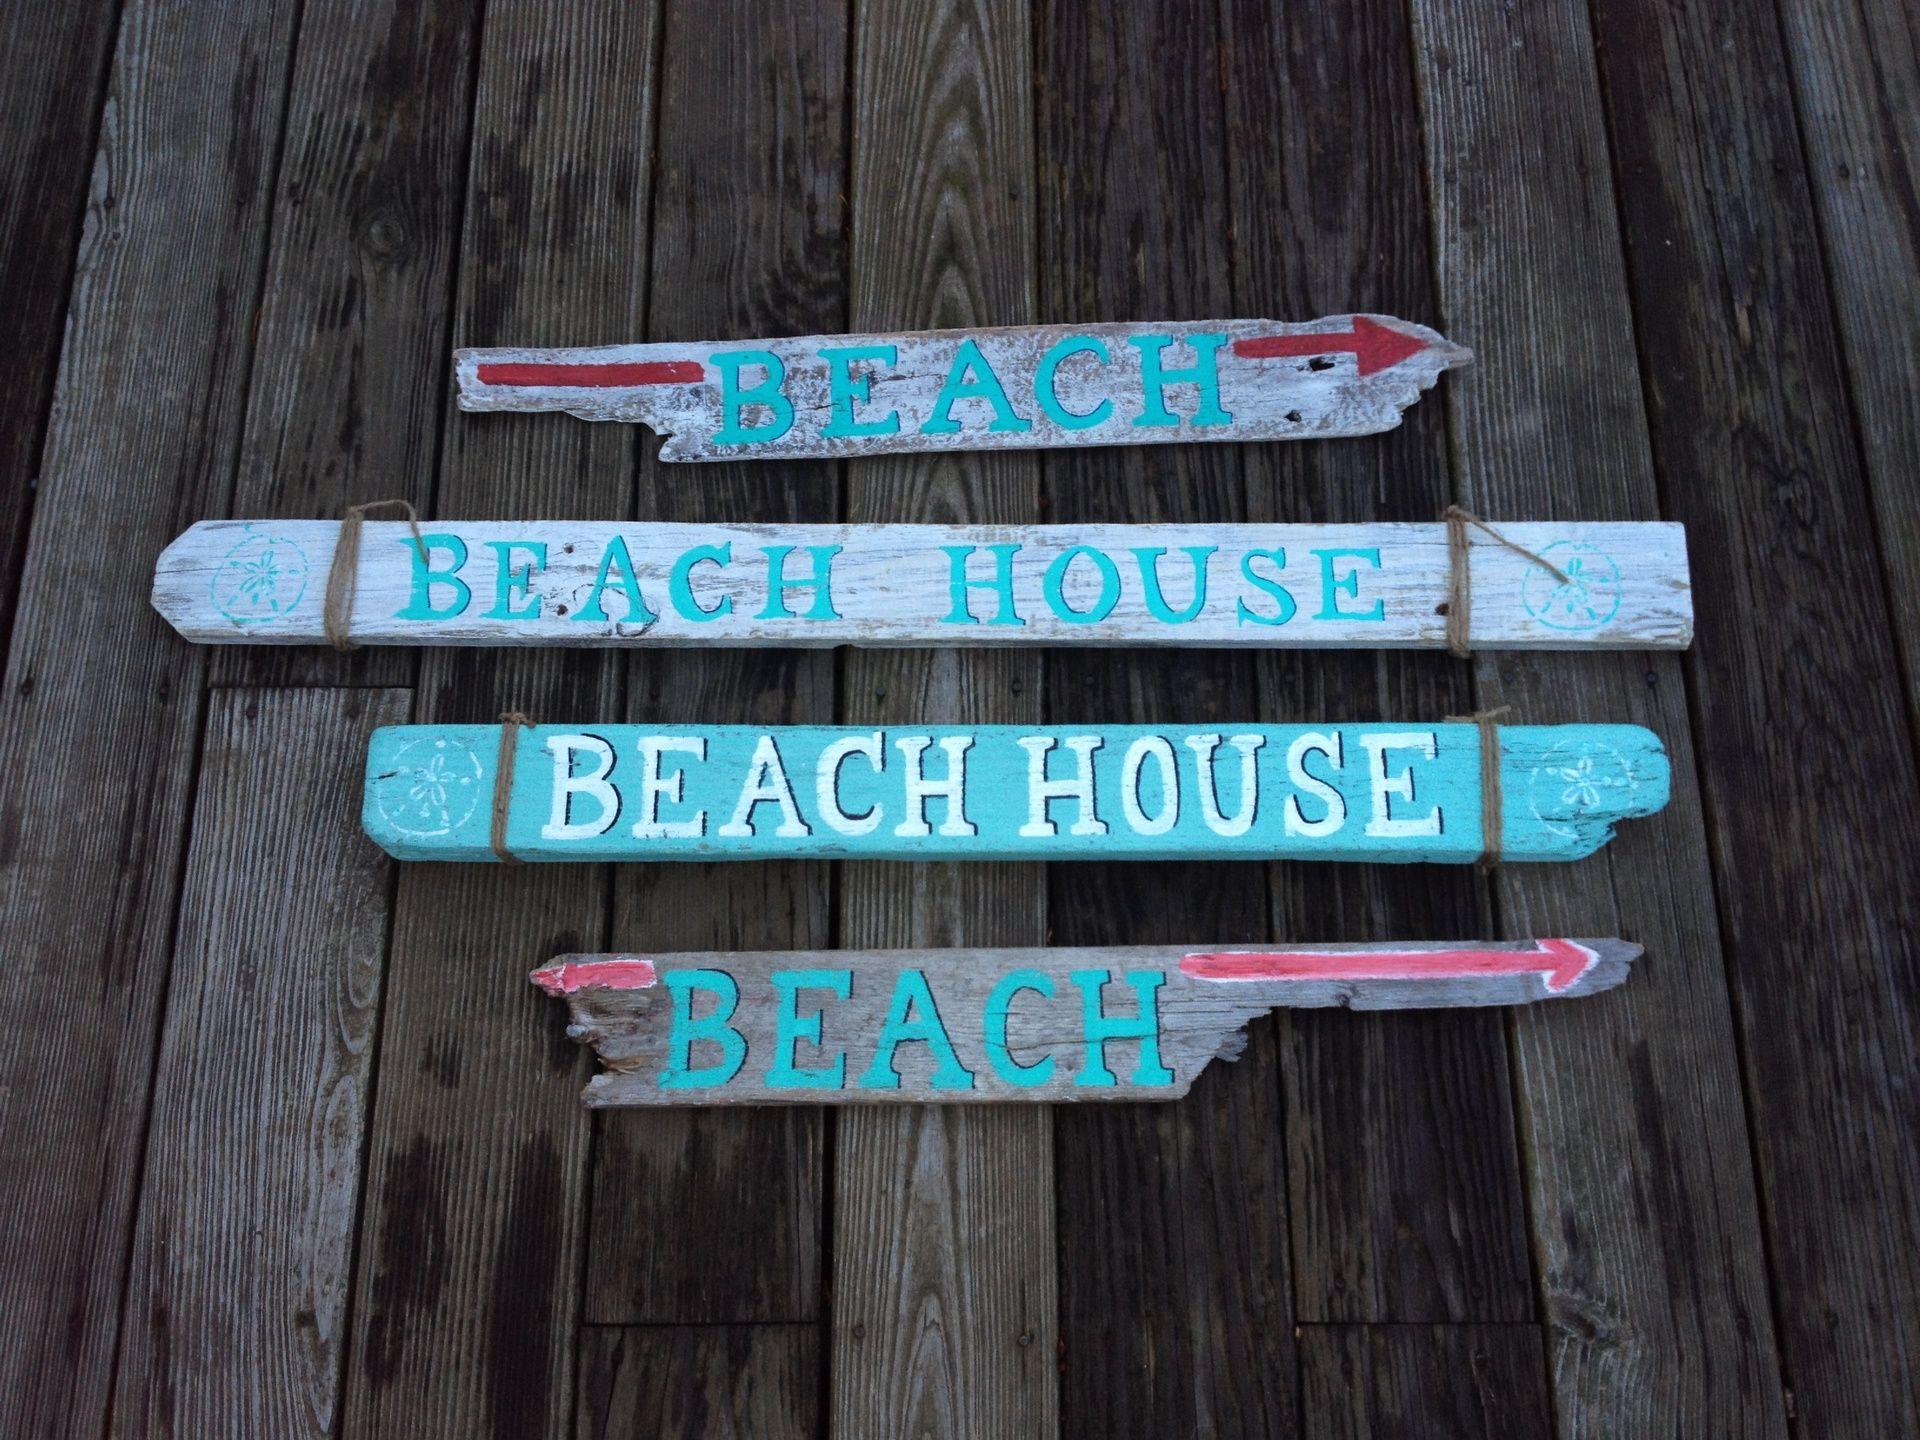 Custom, hand painted wooden signs by www.TotallyADrift.com #ack #nantucket #nantuckethomedecor #nantucketwoodensign #nauticaldecor #BeachHousesigns #beachdirectionalsigns